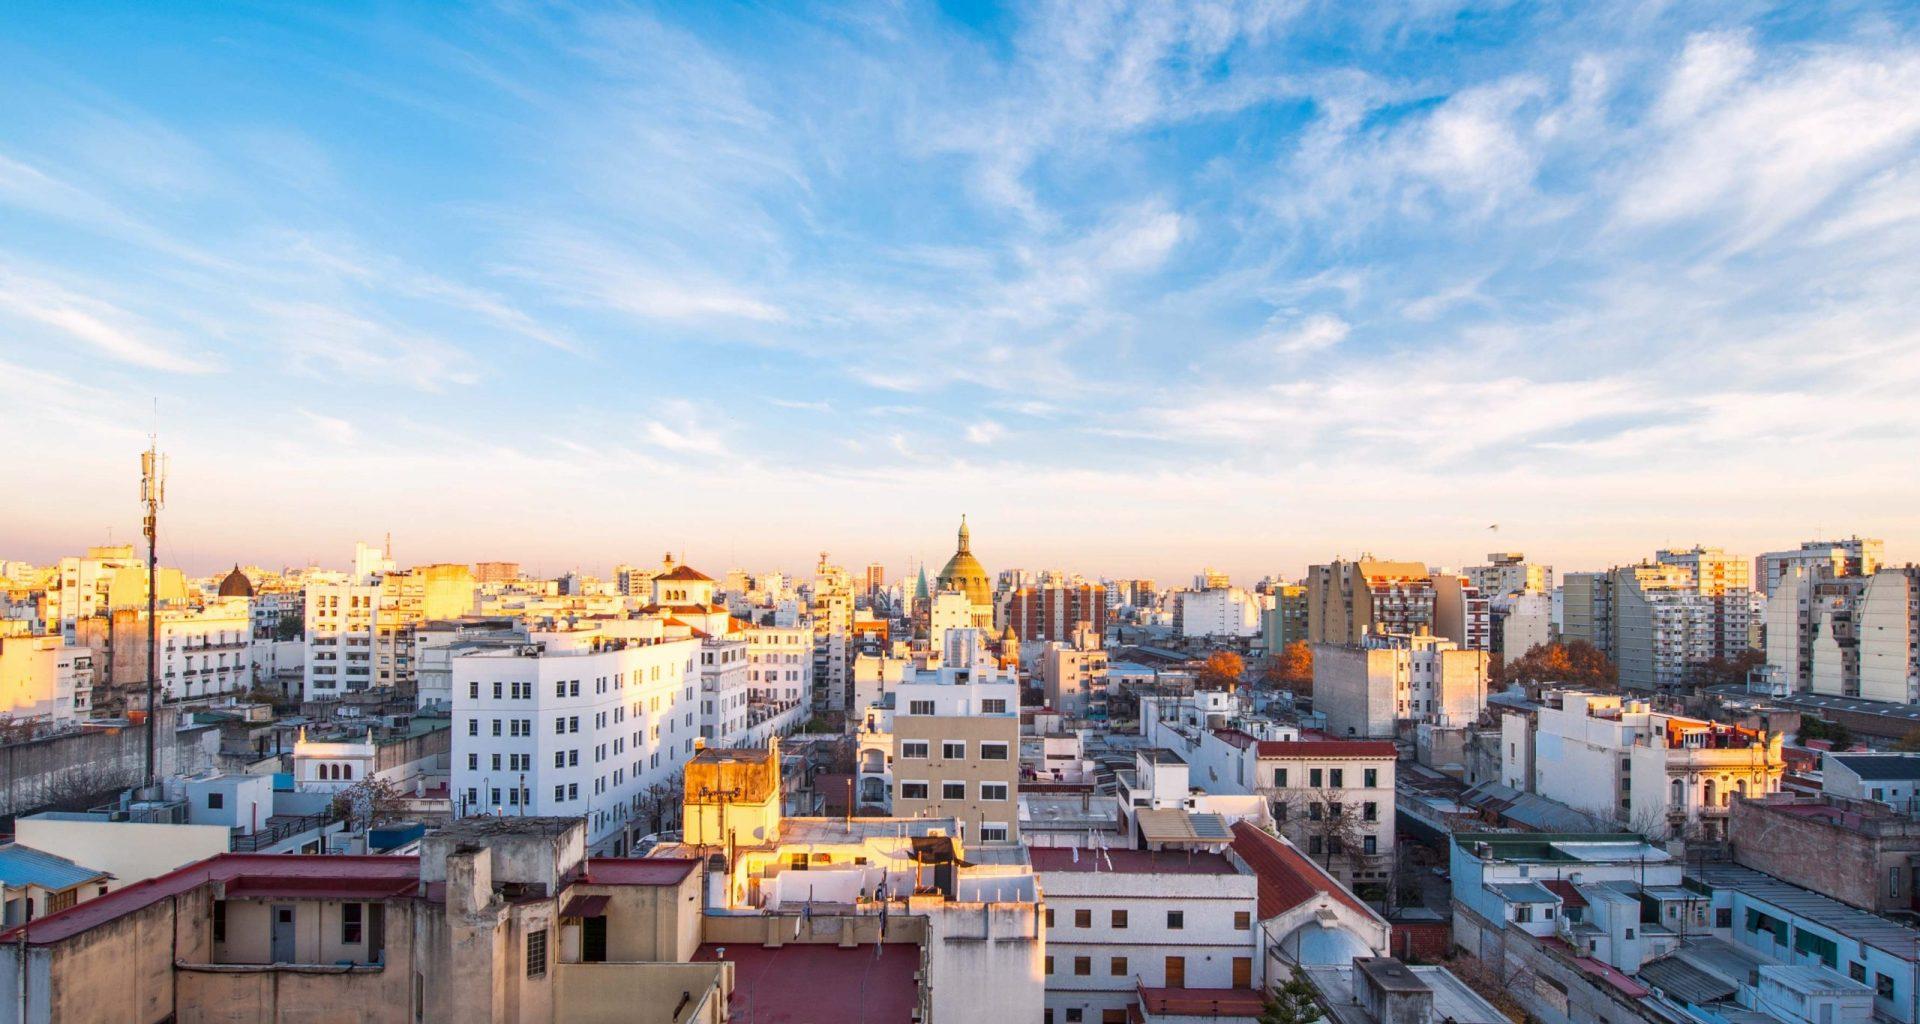 Partial Buenos Aires city skyline.